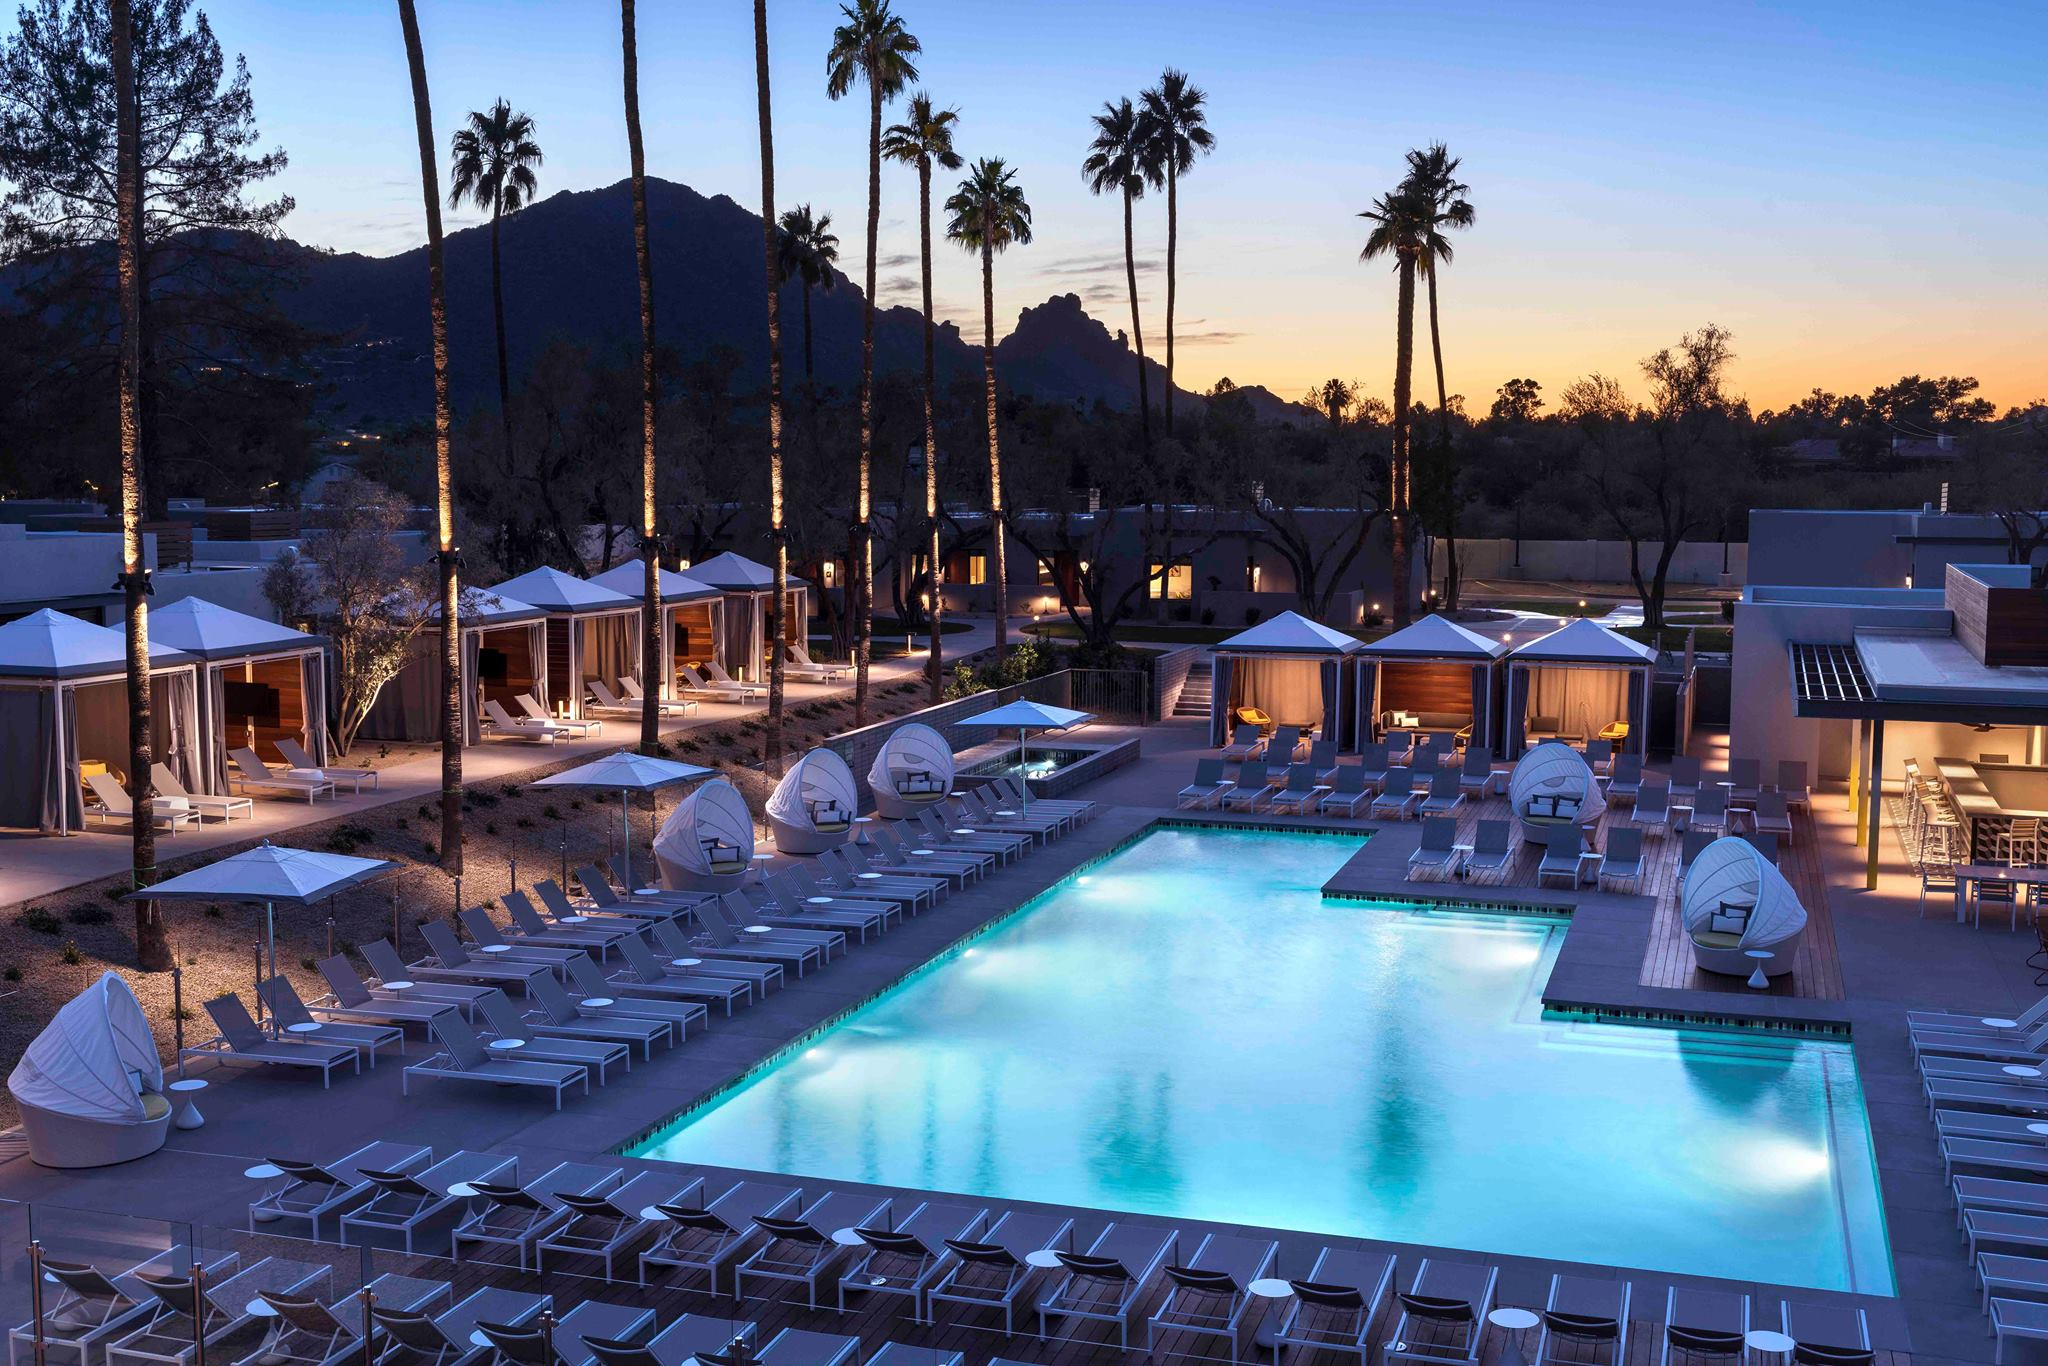 Andaz Scottsdale Resort pool